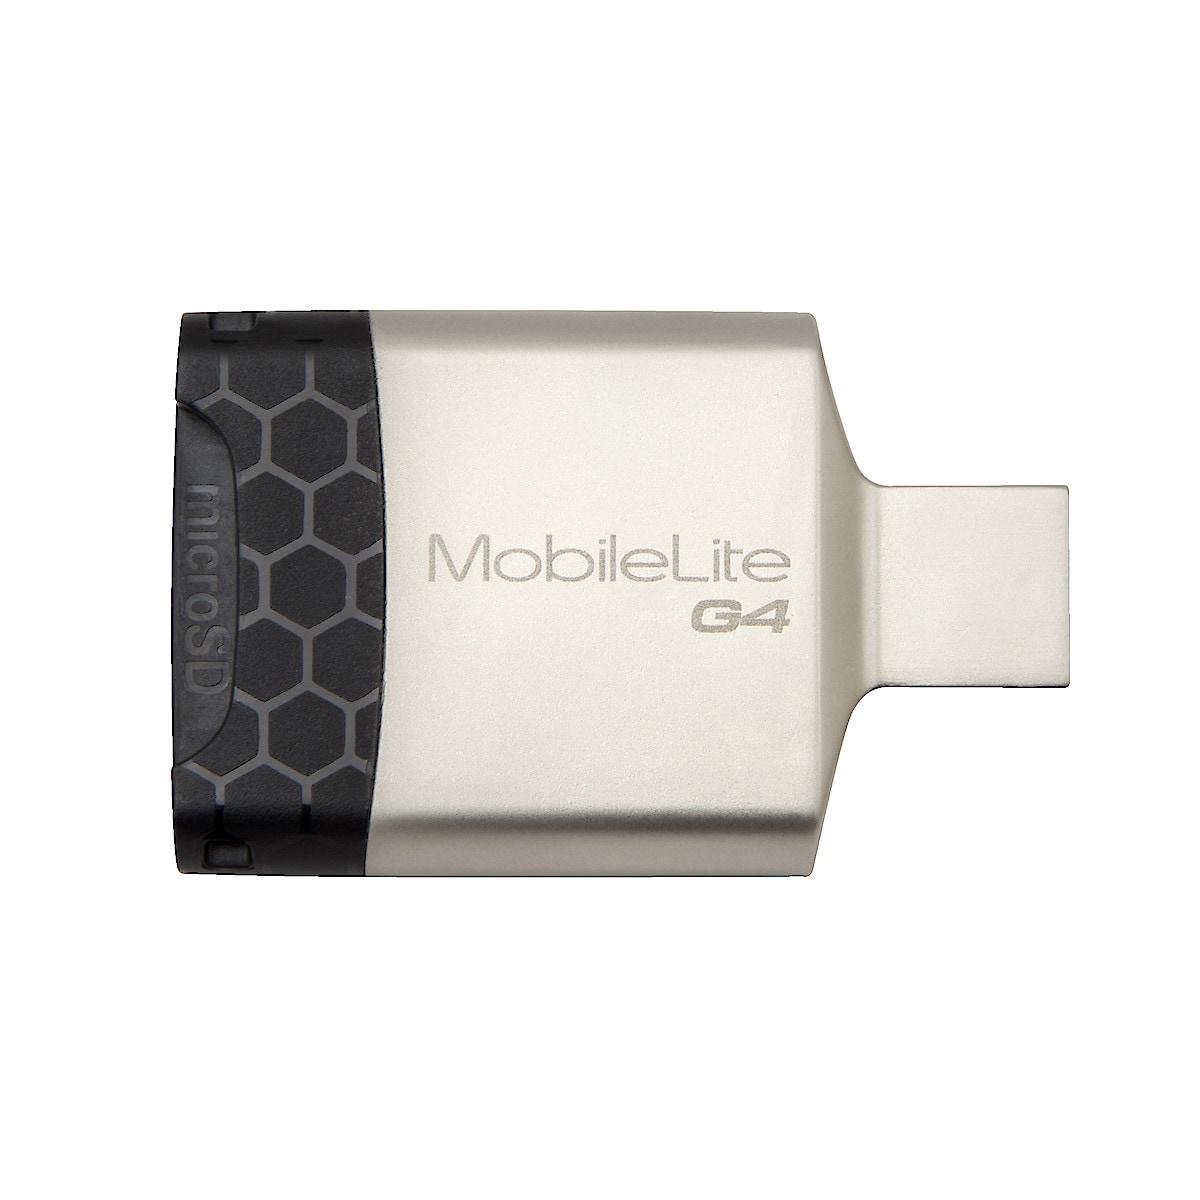 Minneskortsläsare USB 3.0 Kingston MobileLite G4